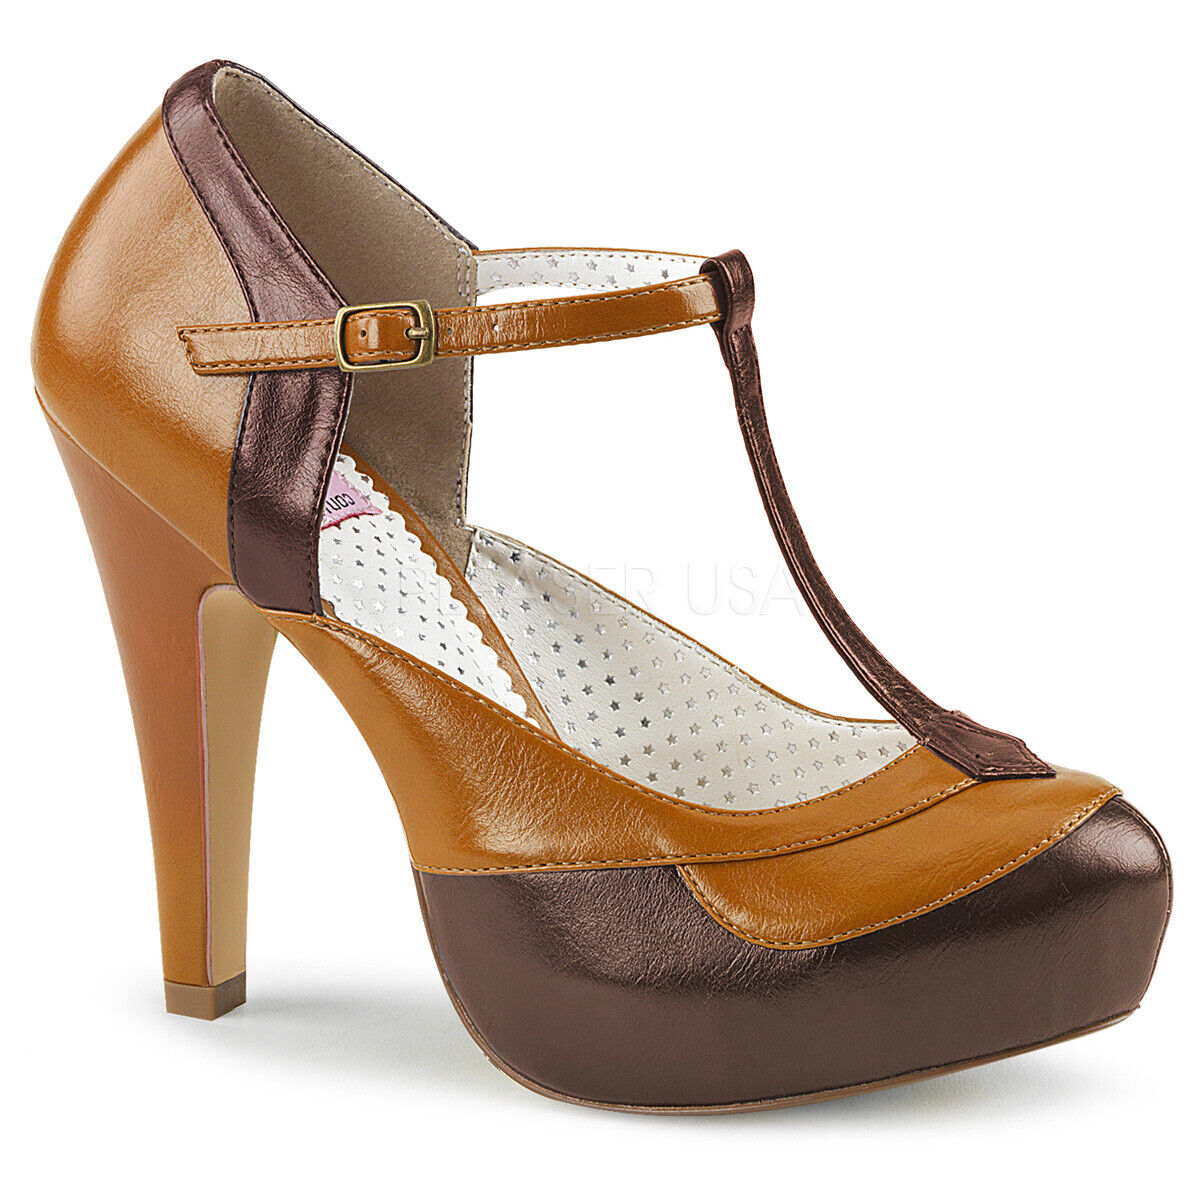 Pin Up Couture BETTIE-29 Womens Dark Brown Maple Faux Leather Heel Platform Pump